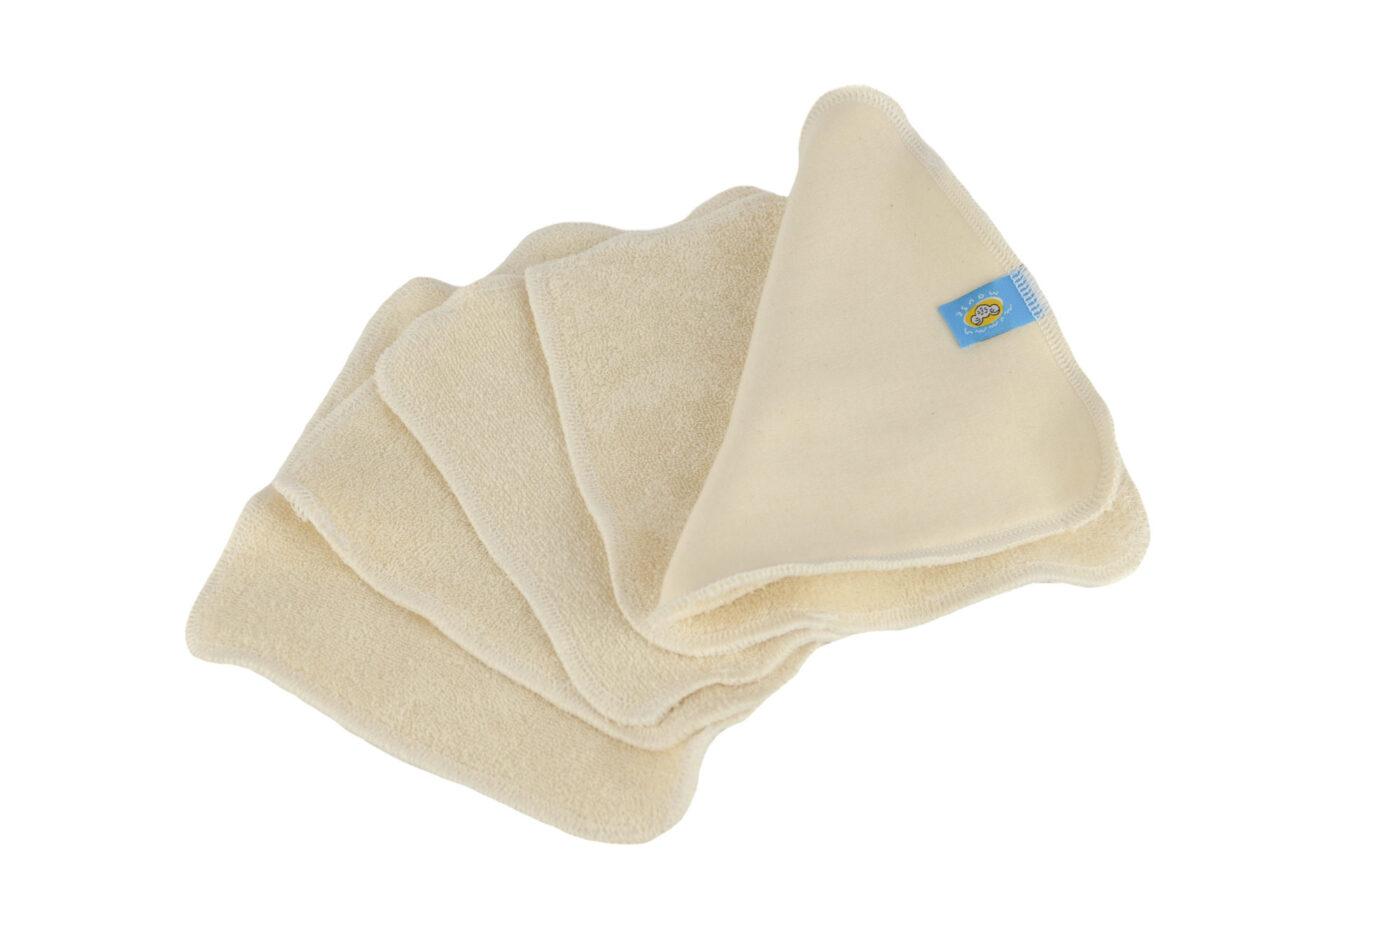 Reusable wipes 5pcs COTTON ORGANIC